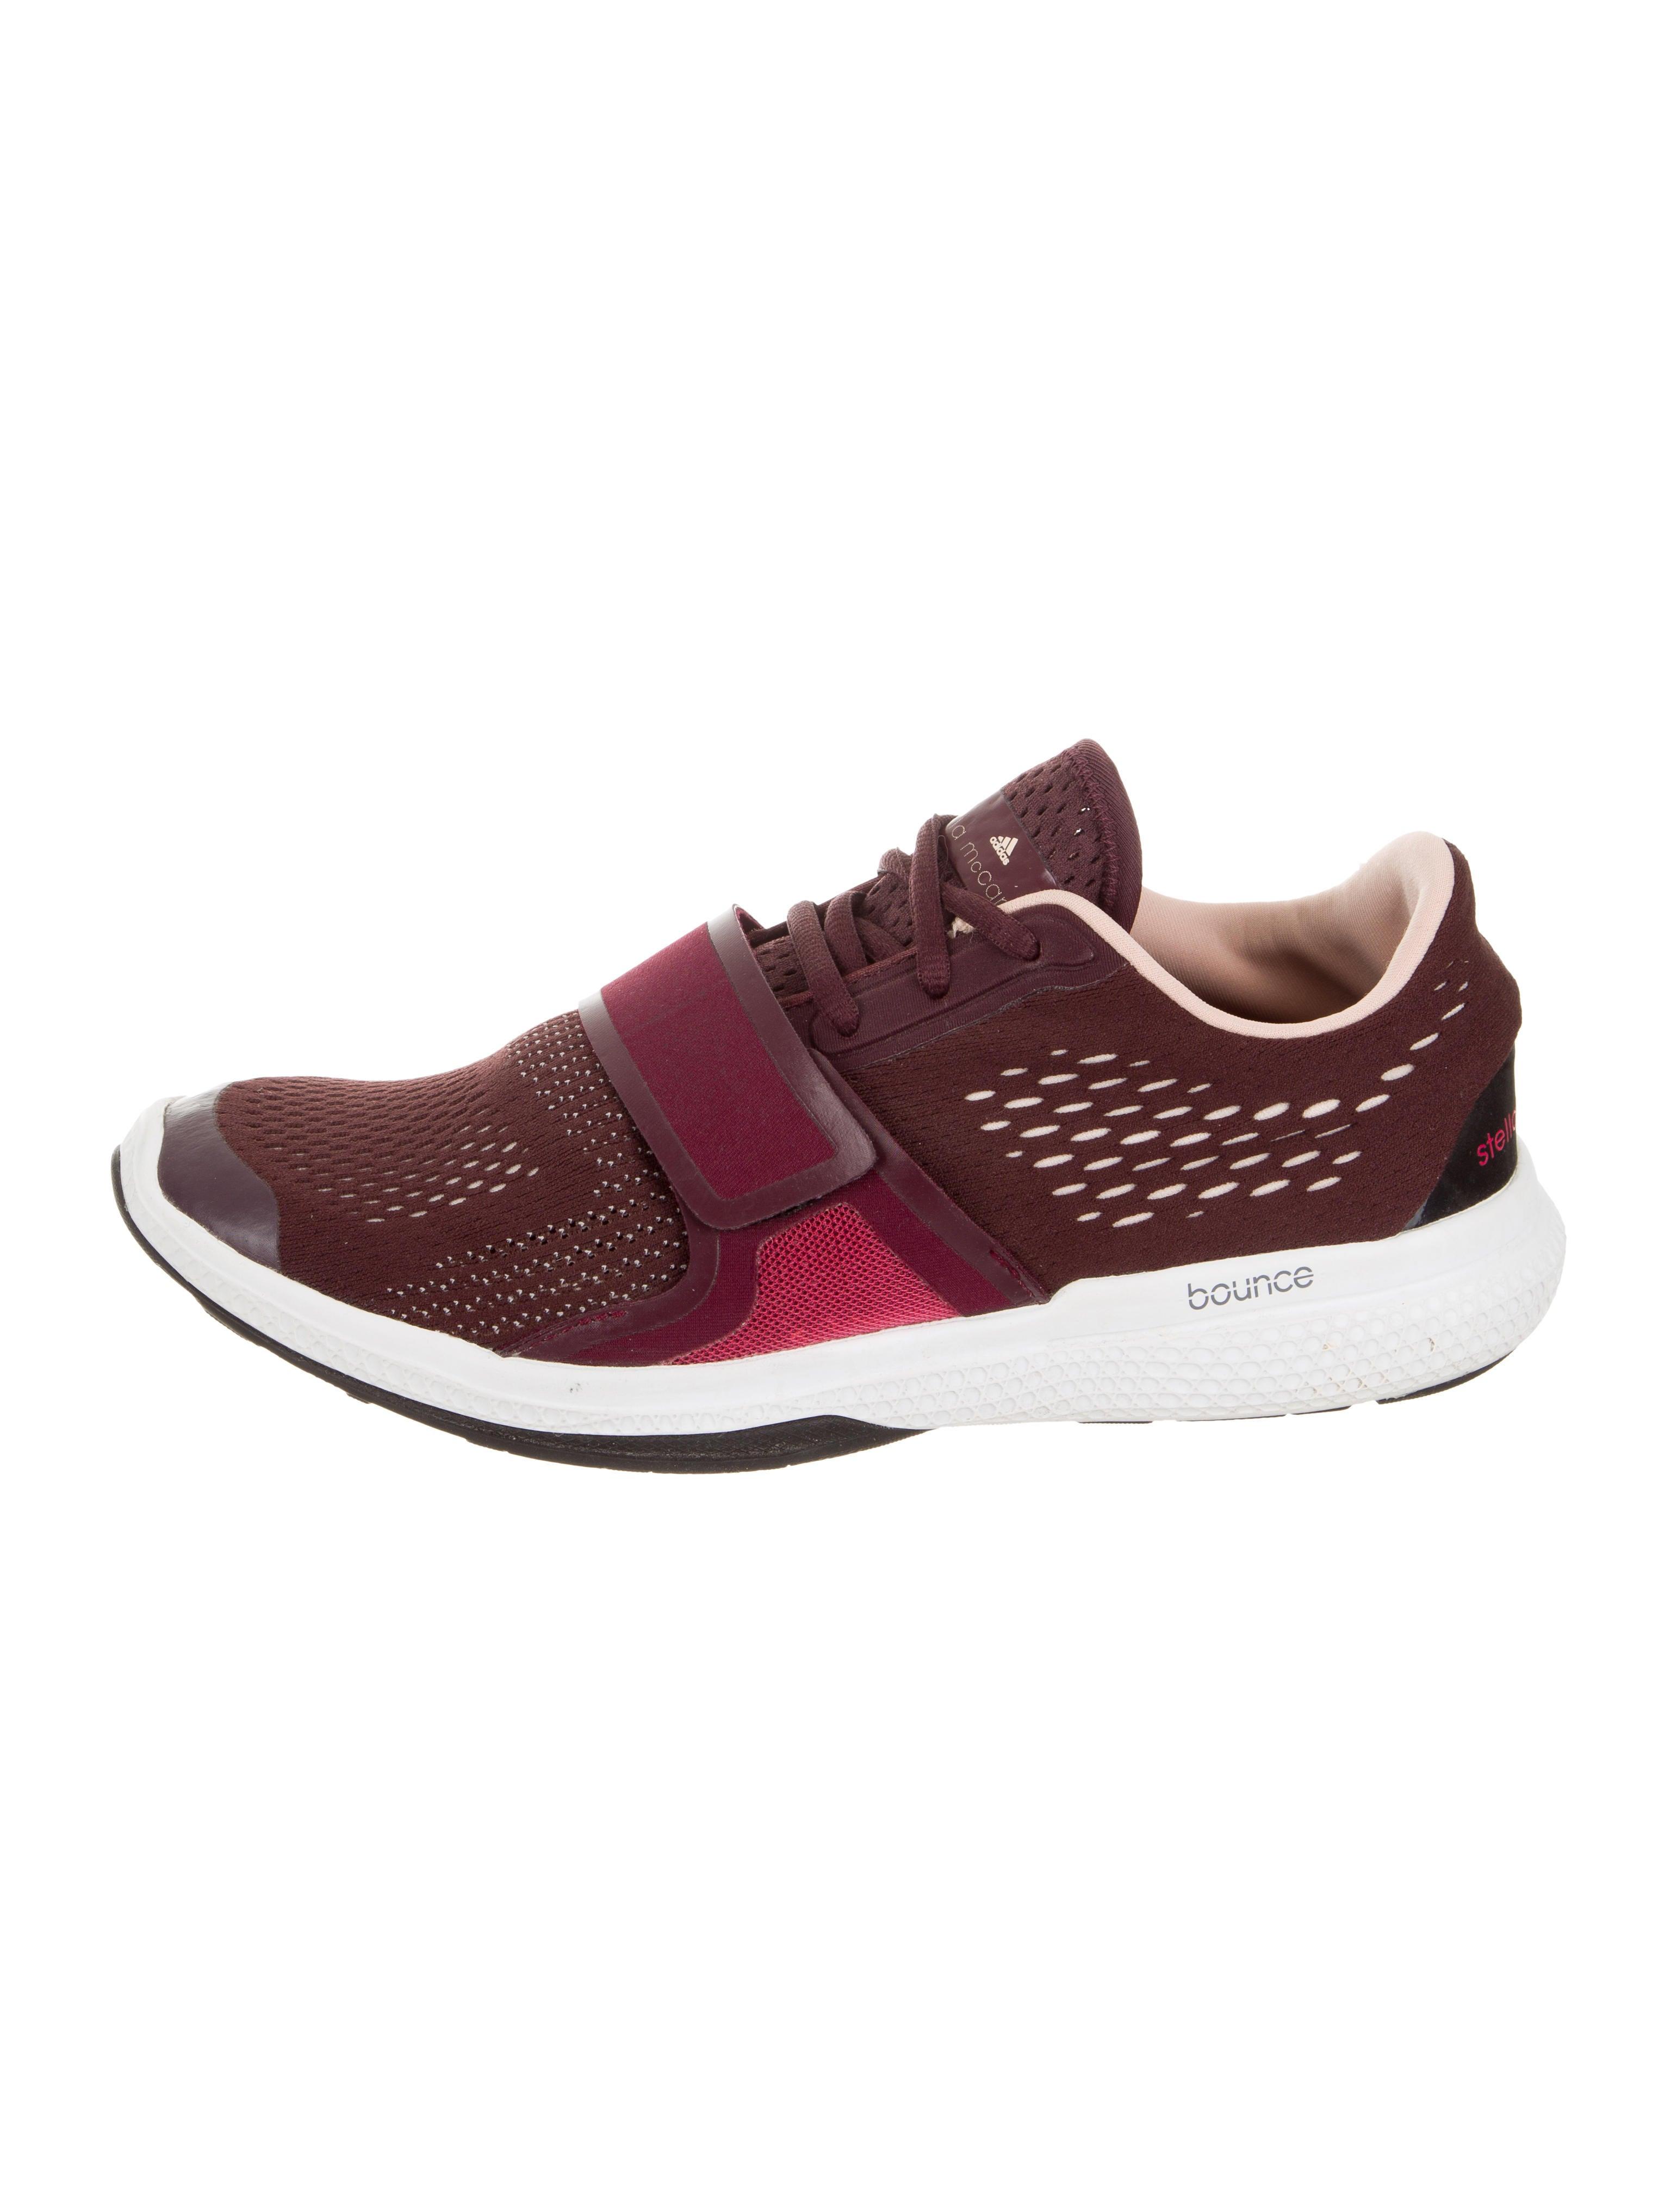 67b503cd7c53d Stella McCartney for adidas Stella McCartney for Adidas Atani Bounce ...